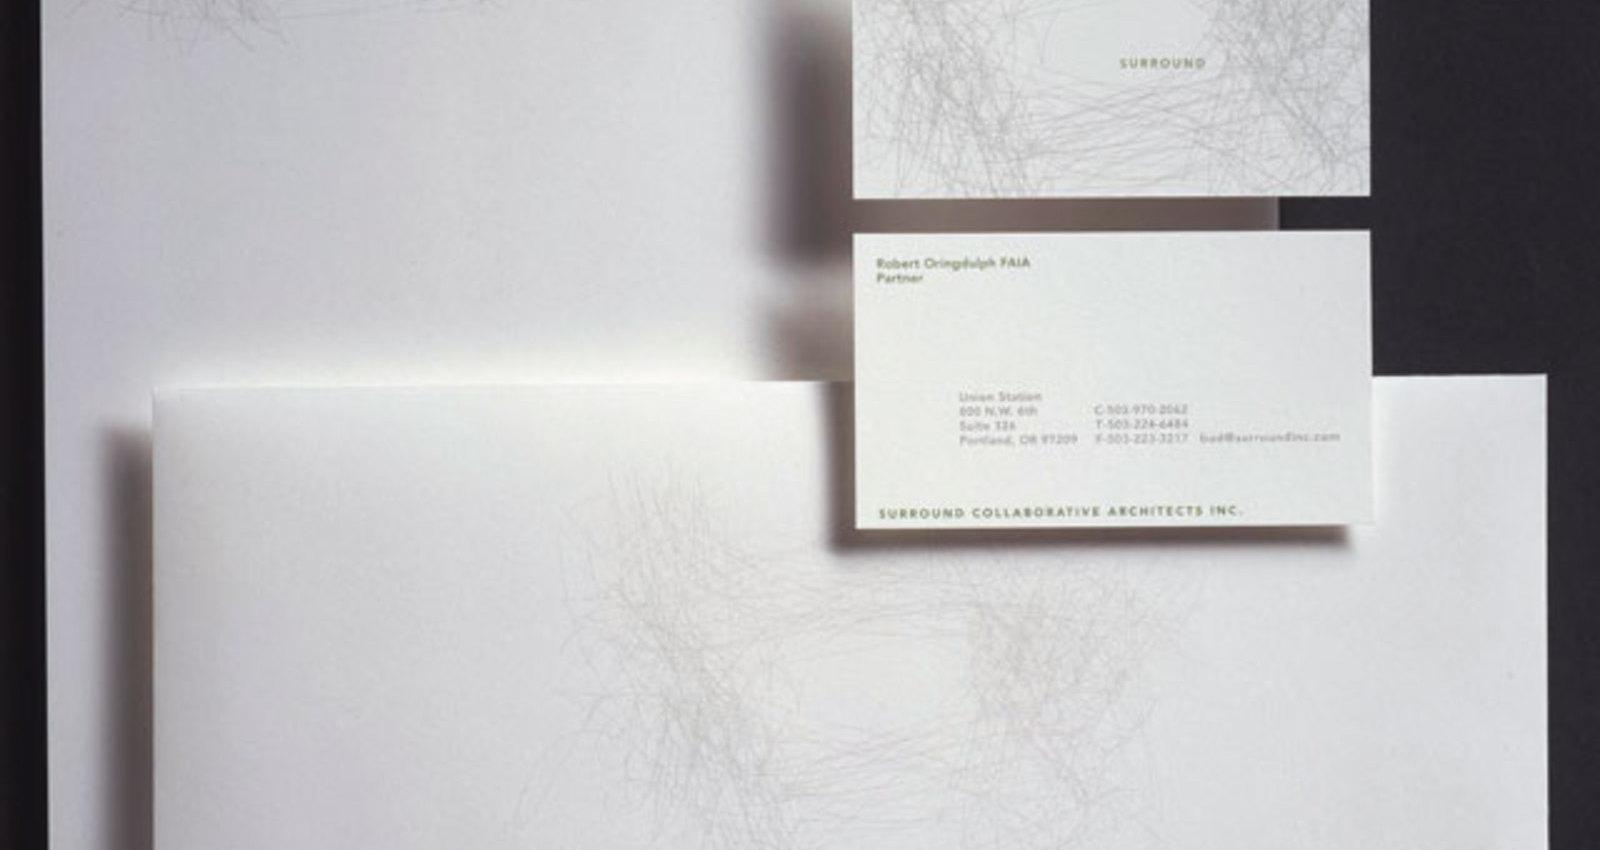 Surround Collaborative Architects Corporate Identity